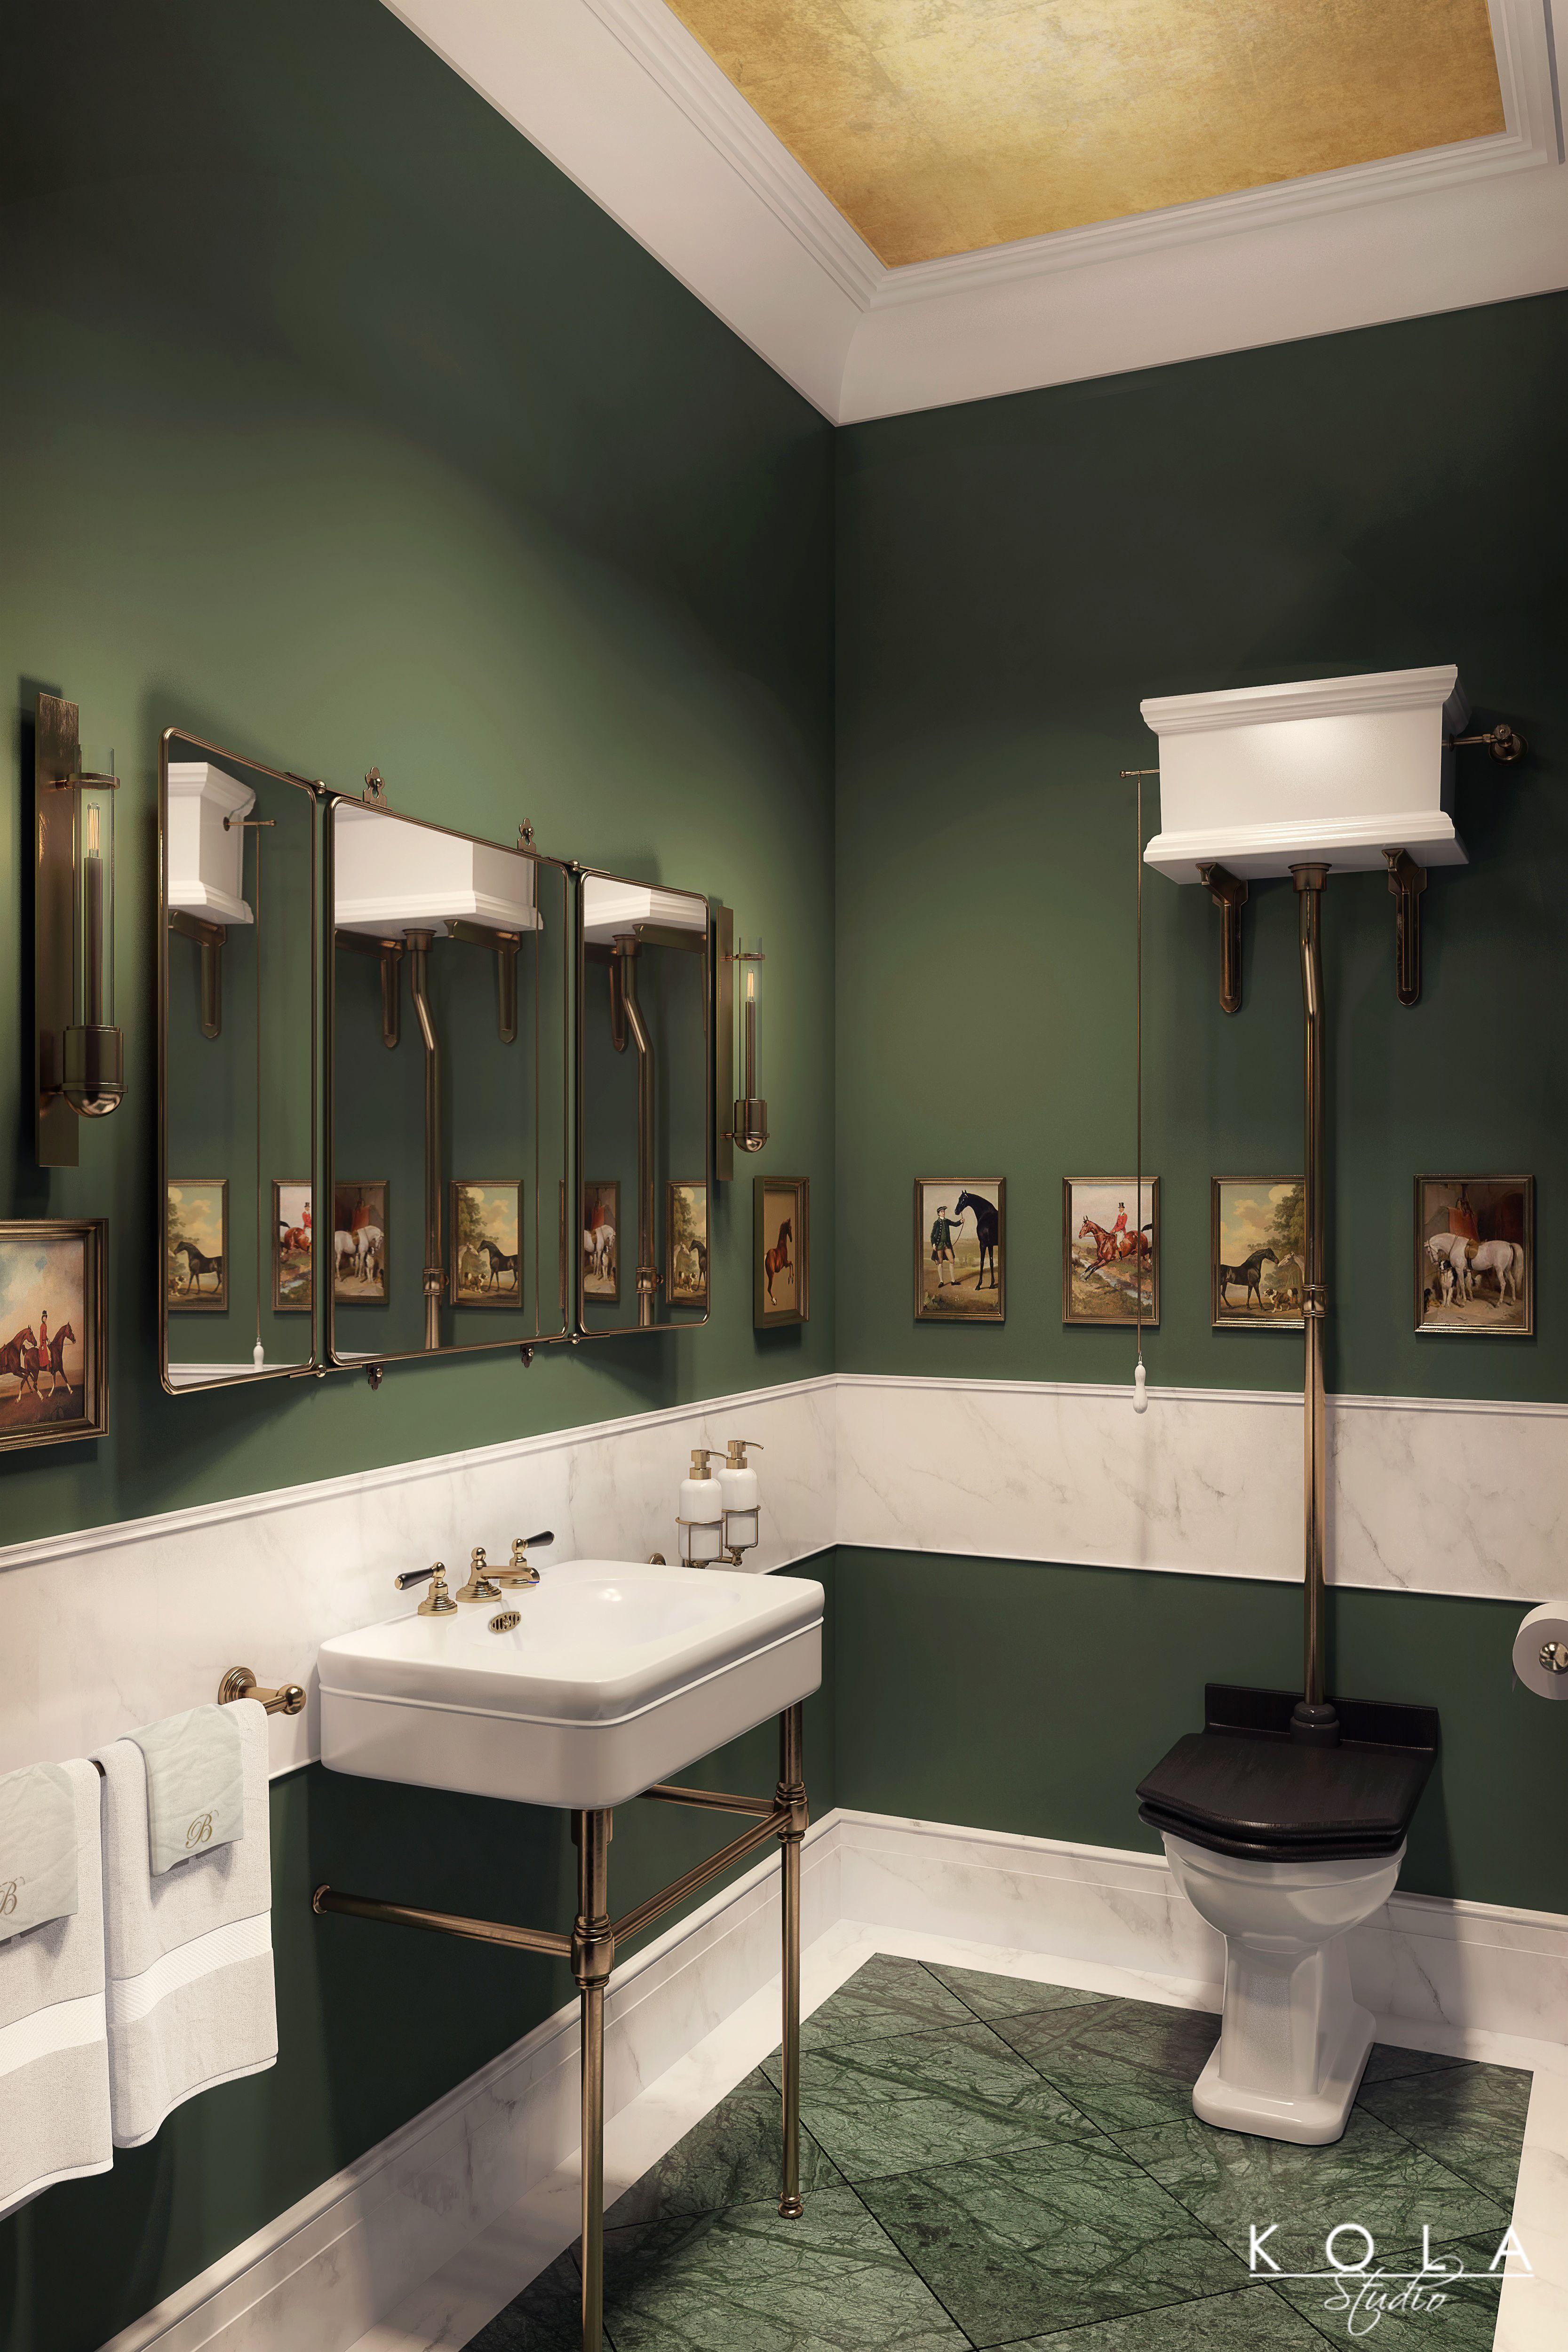 Bathroom Kola Studio Architectural Visualization In 2020 Trendy Bathroom Tiles Green Bathroom Bathroom Interior Design